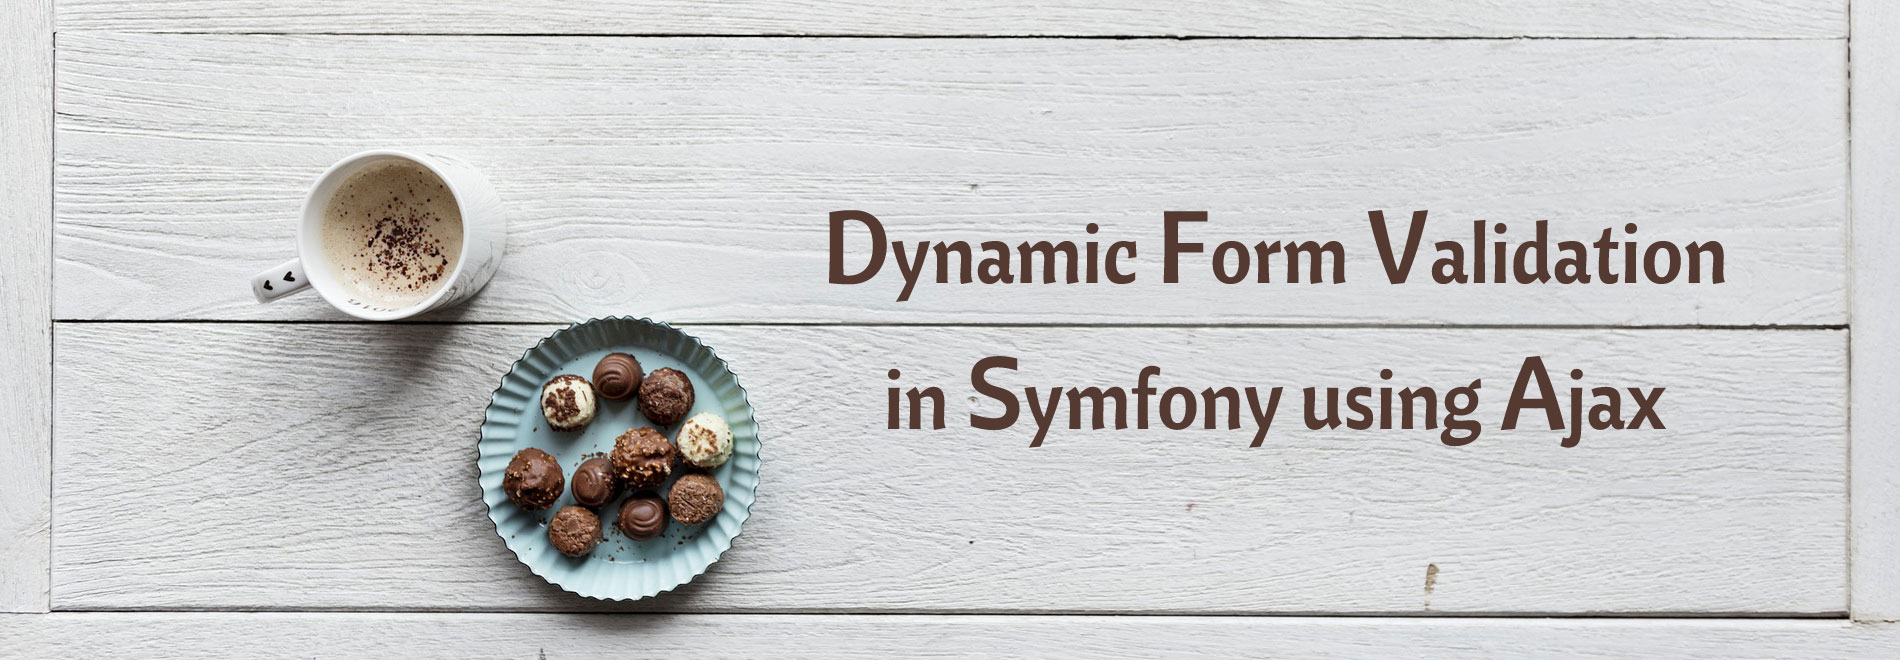 Dynamic Form Validation in Symfony using Ajax – GrowingCookies